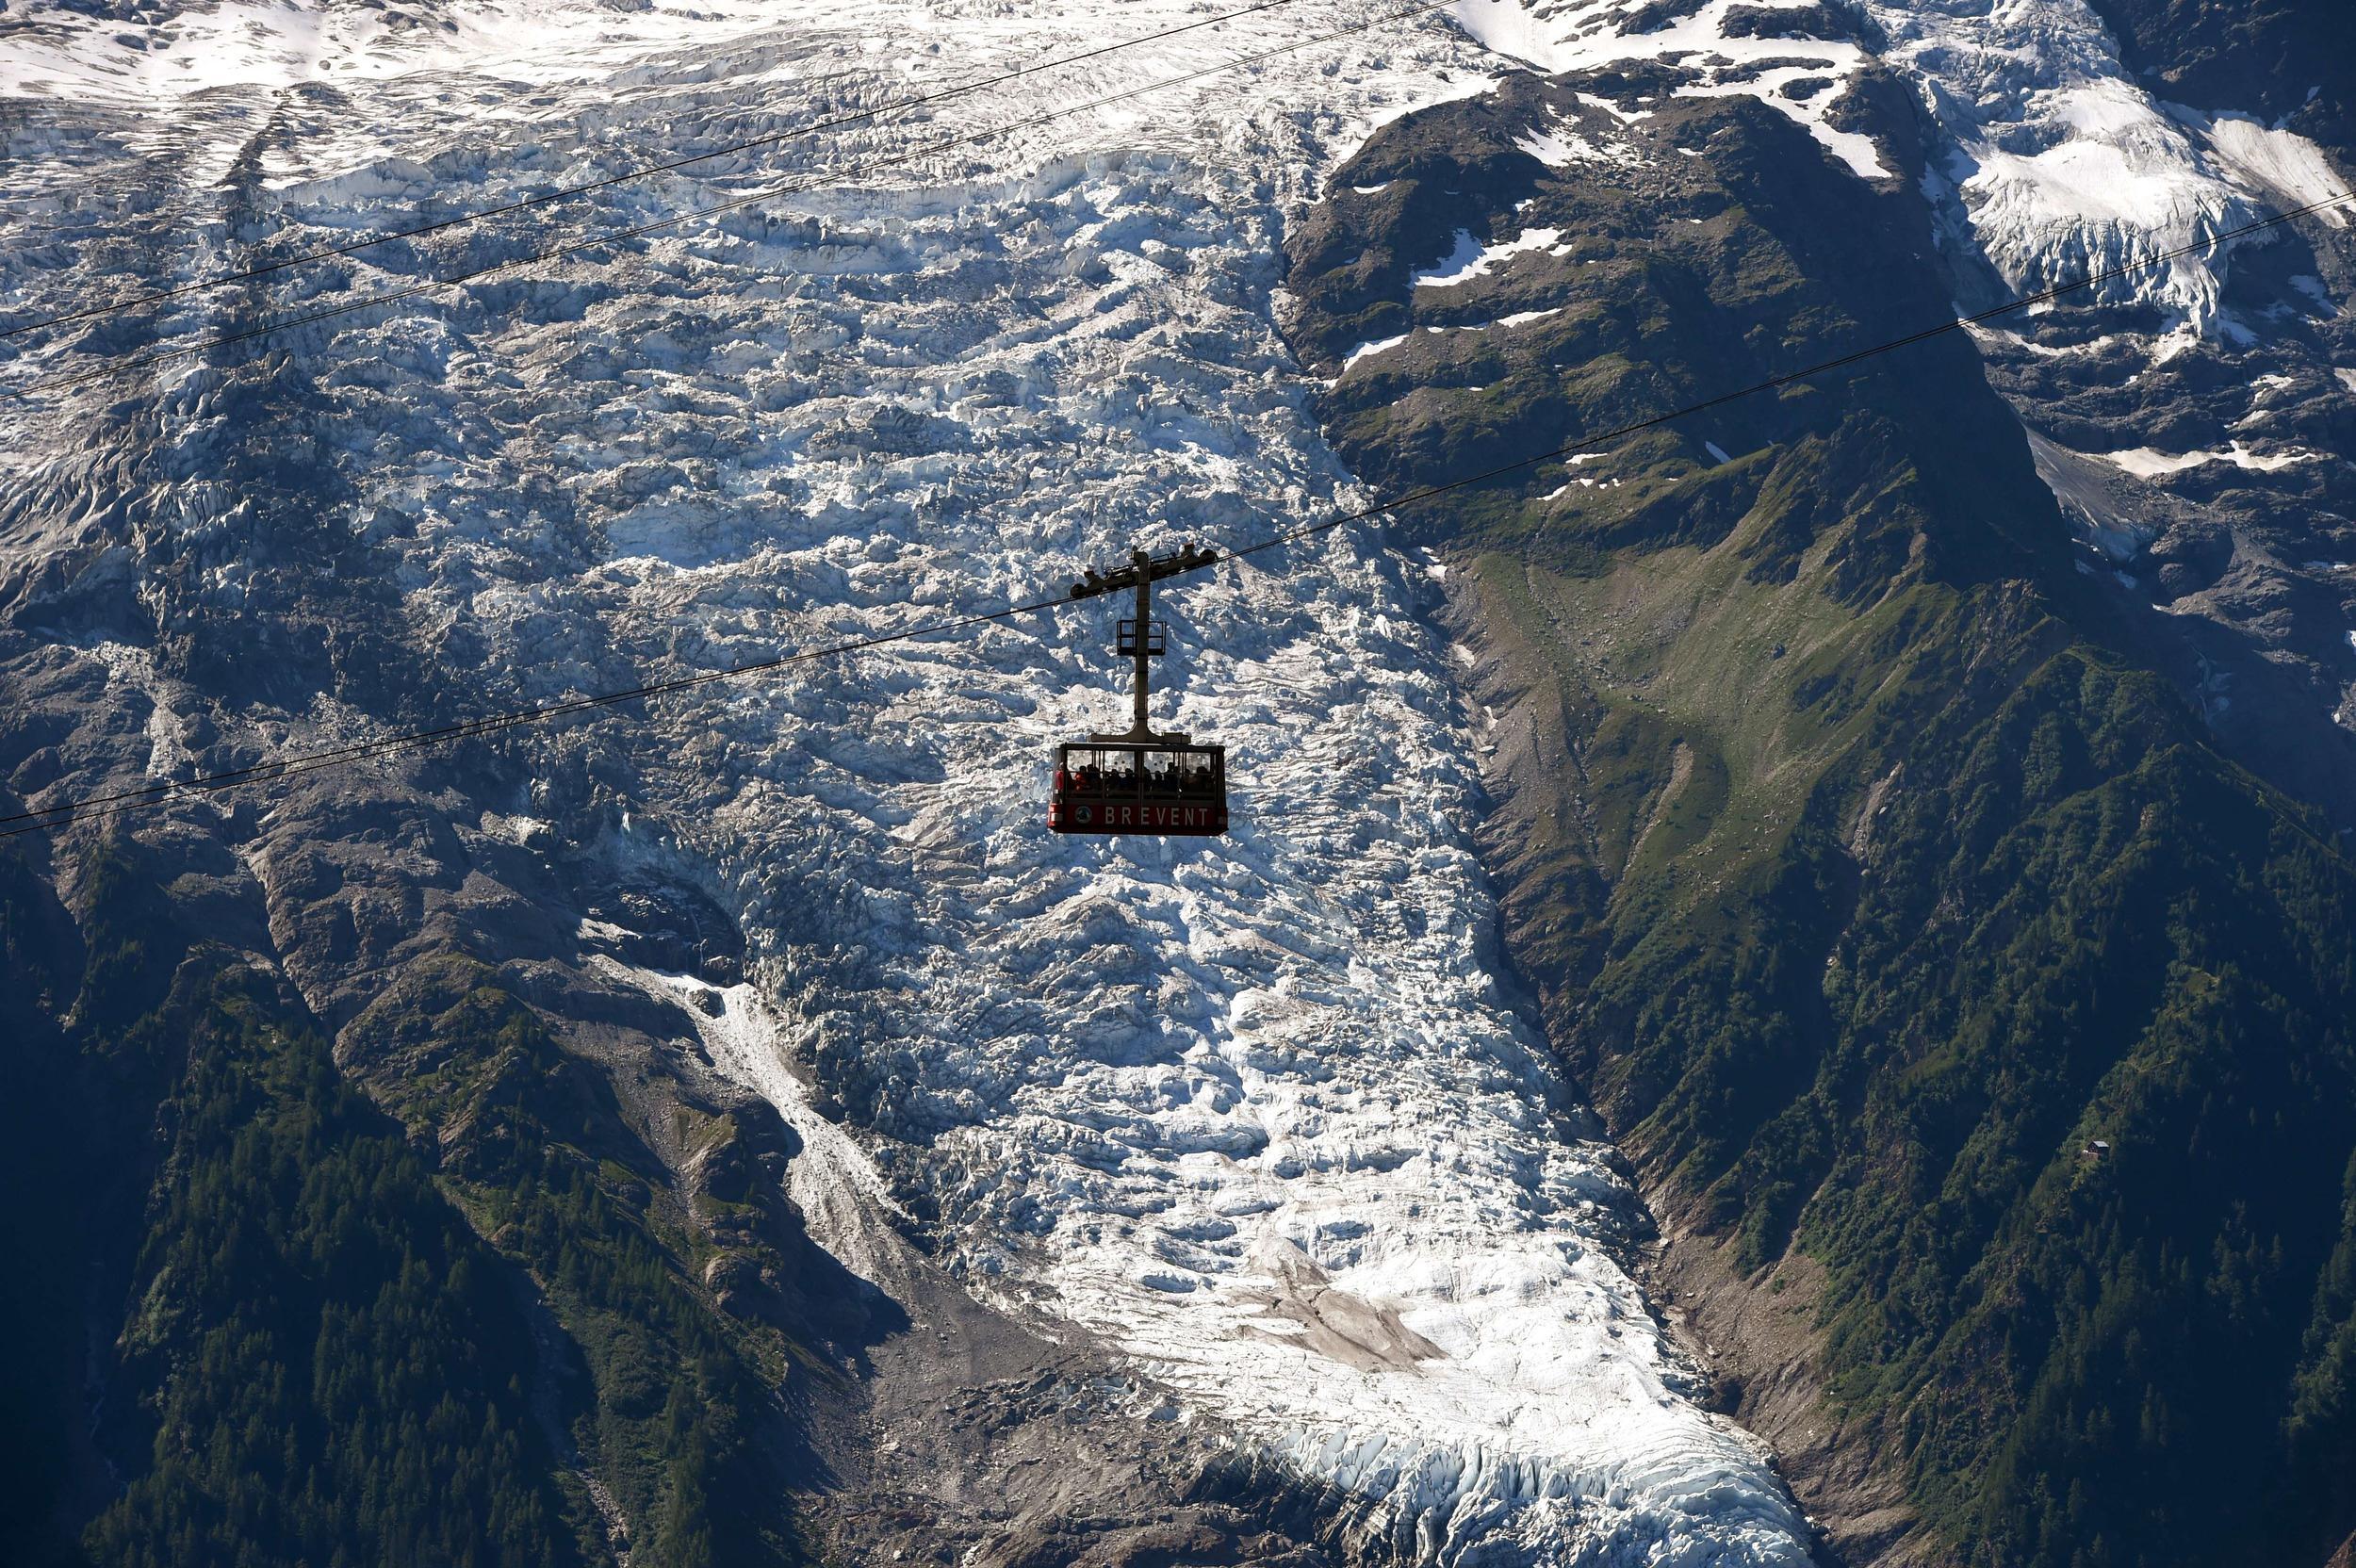 chamonix glacier case study